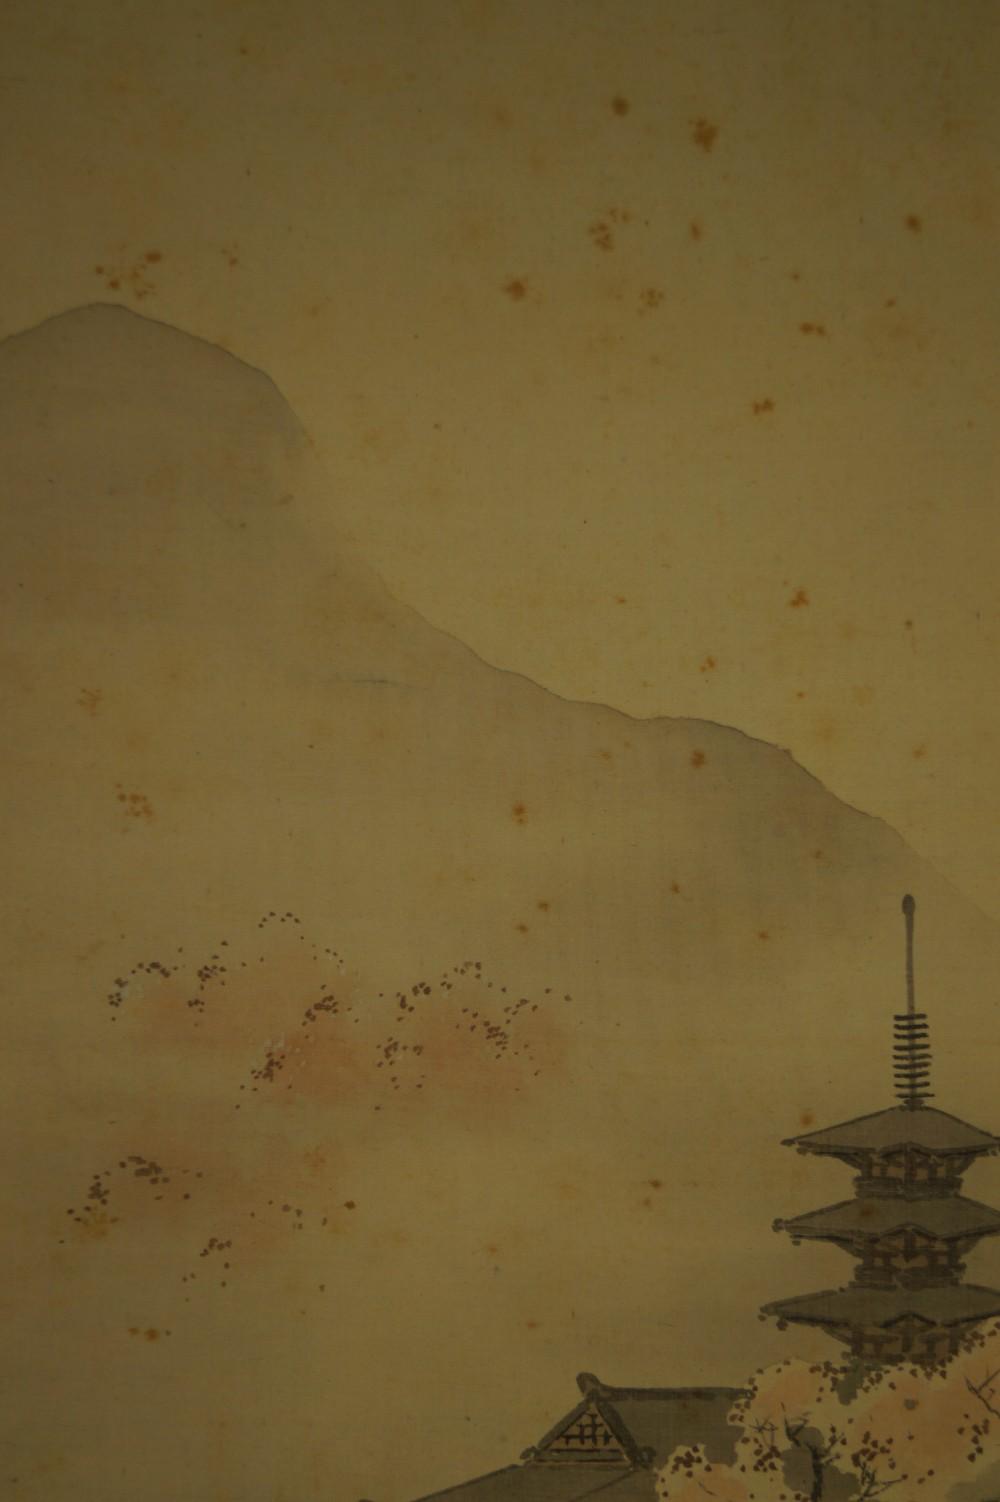 Sommer - Japanisches Rollbild (Kakejiku, Kakemono)